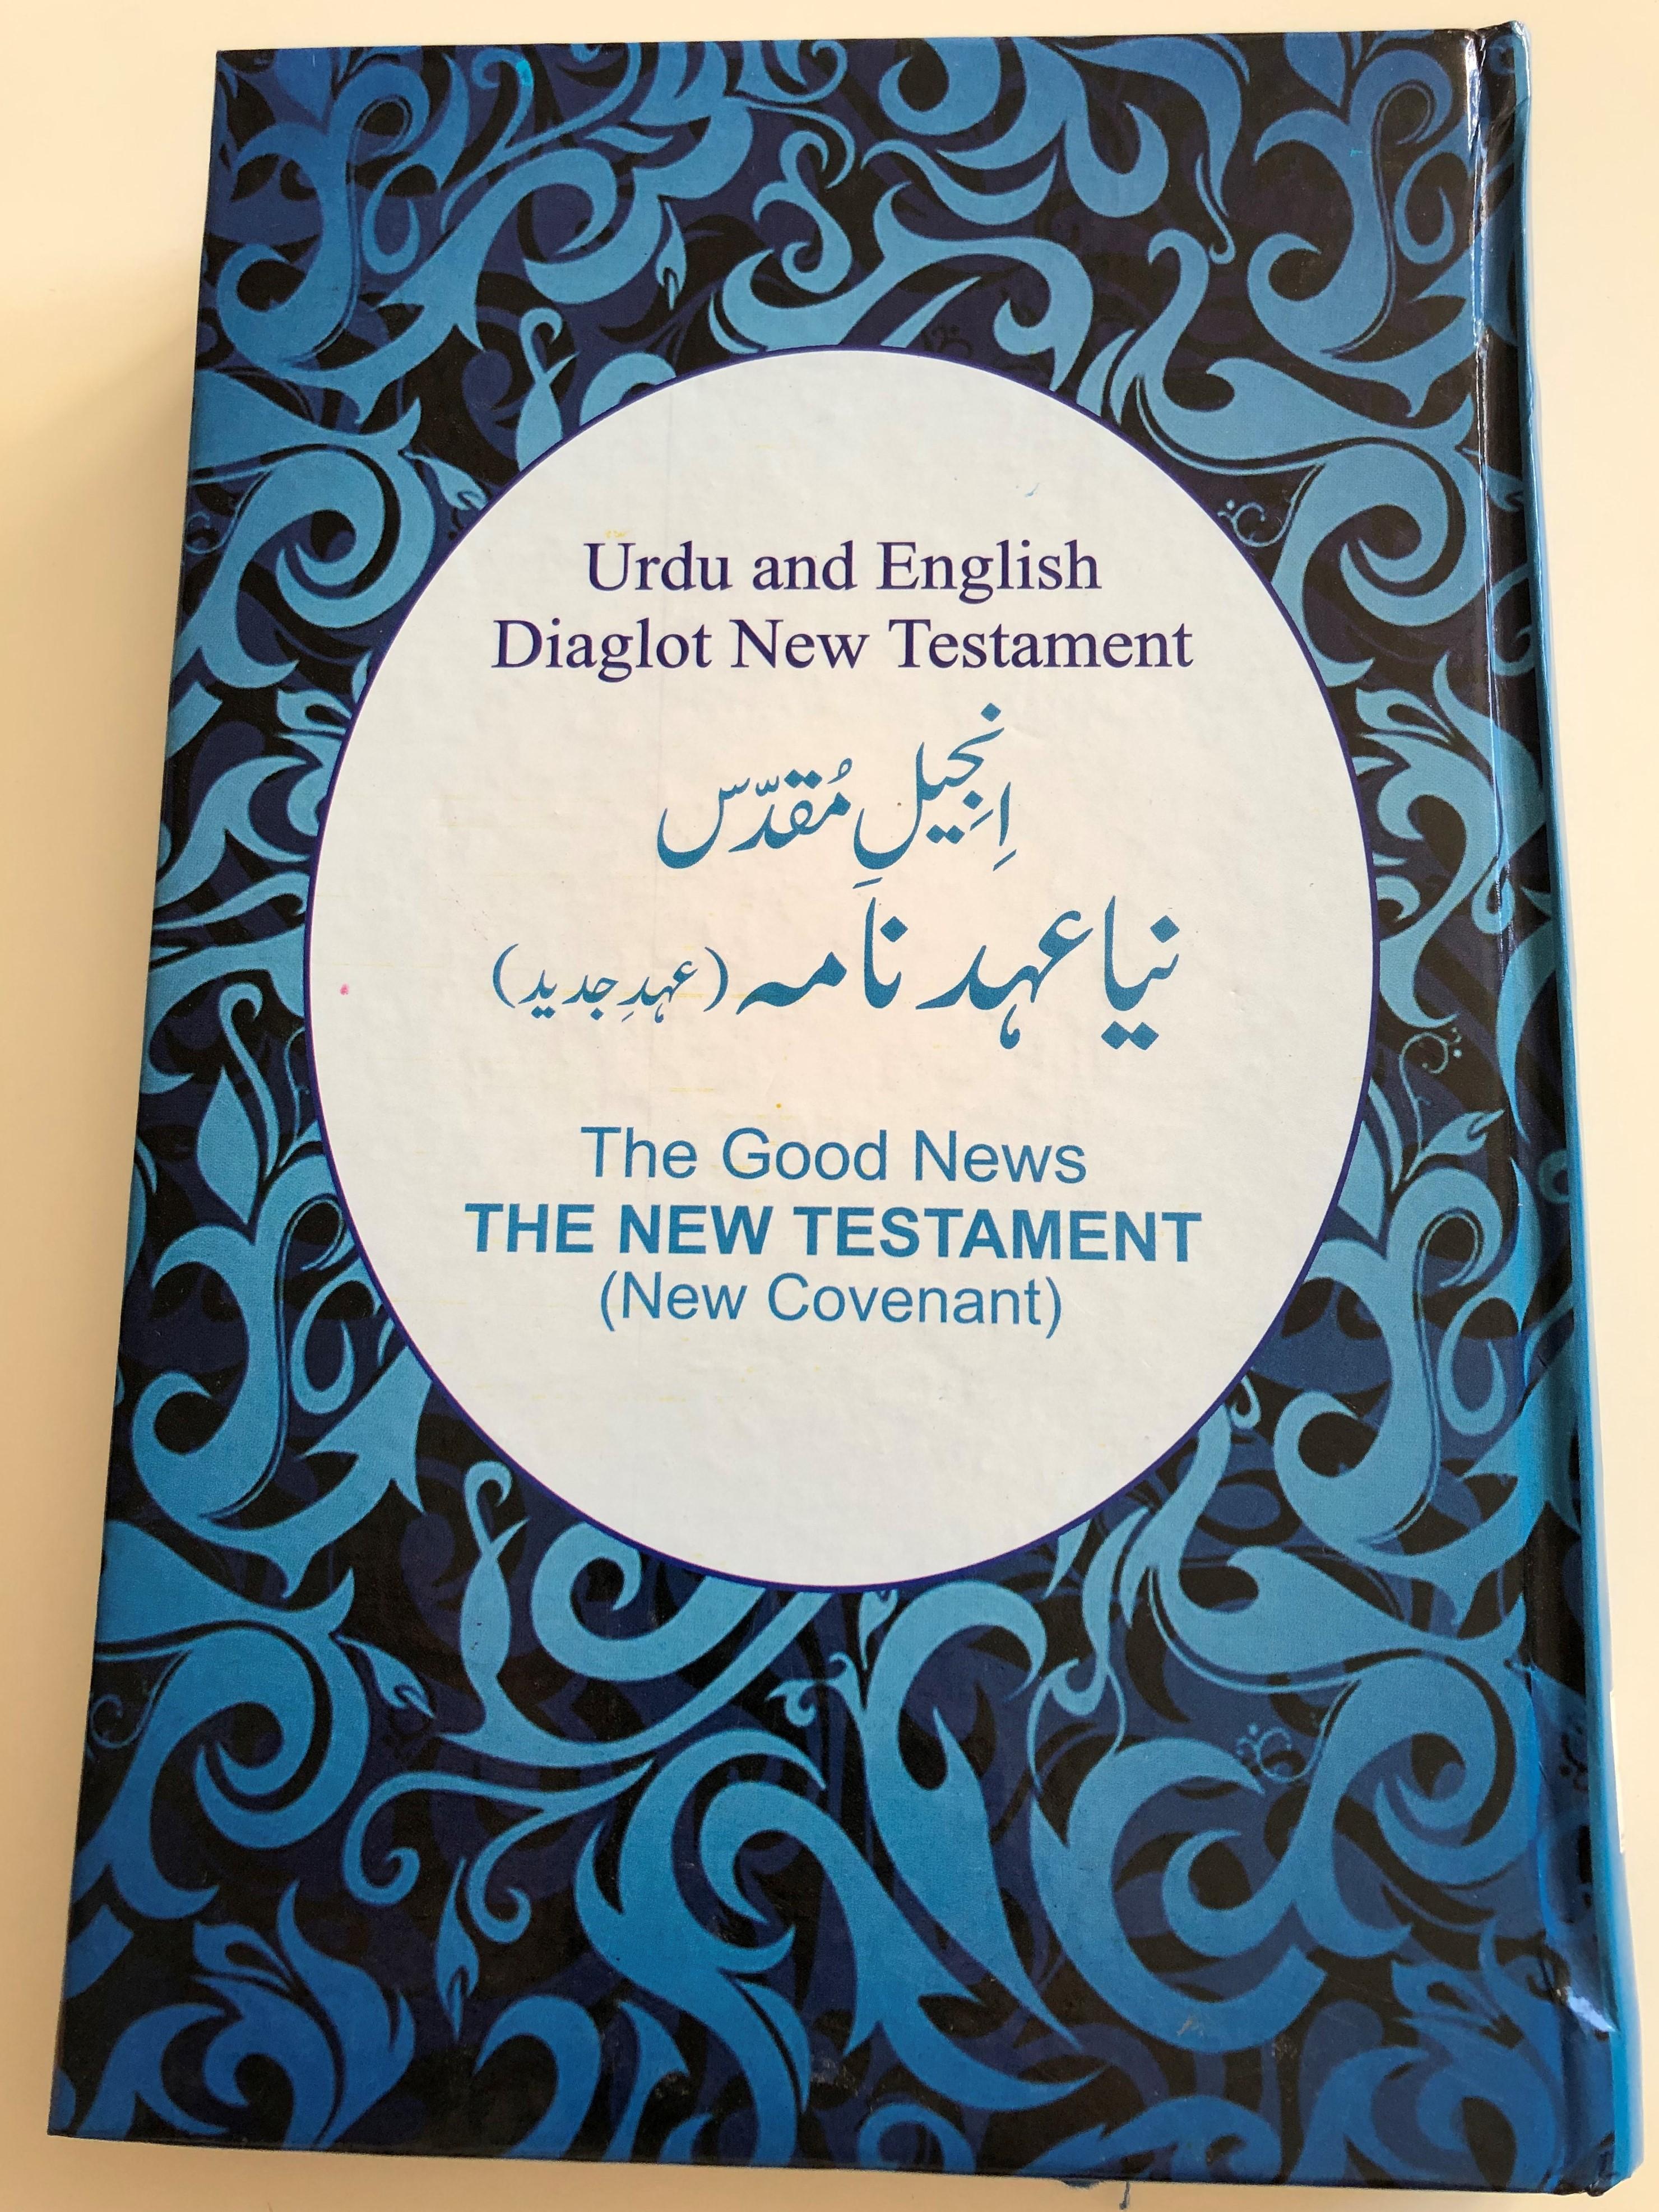 english-urdu-diaglot-bilingual-new-testament-1-.jpg